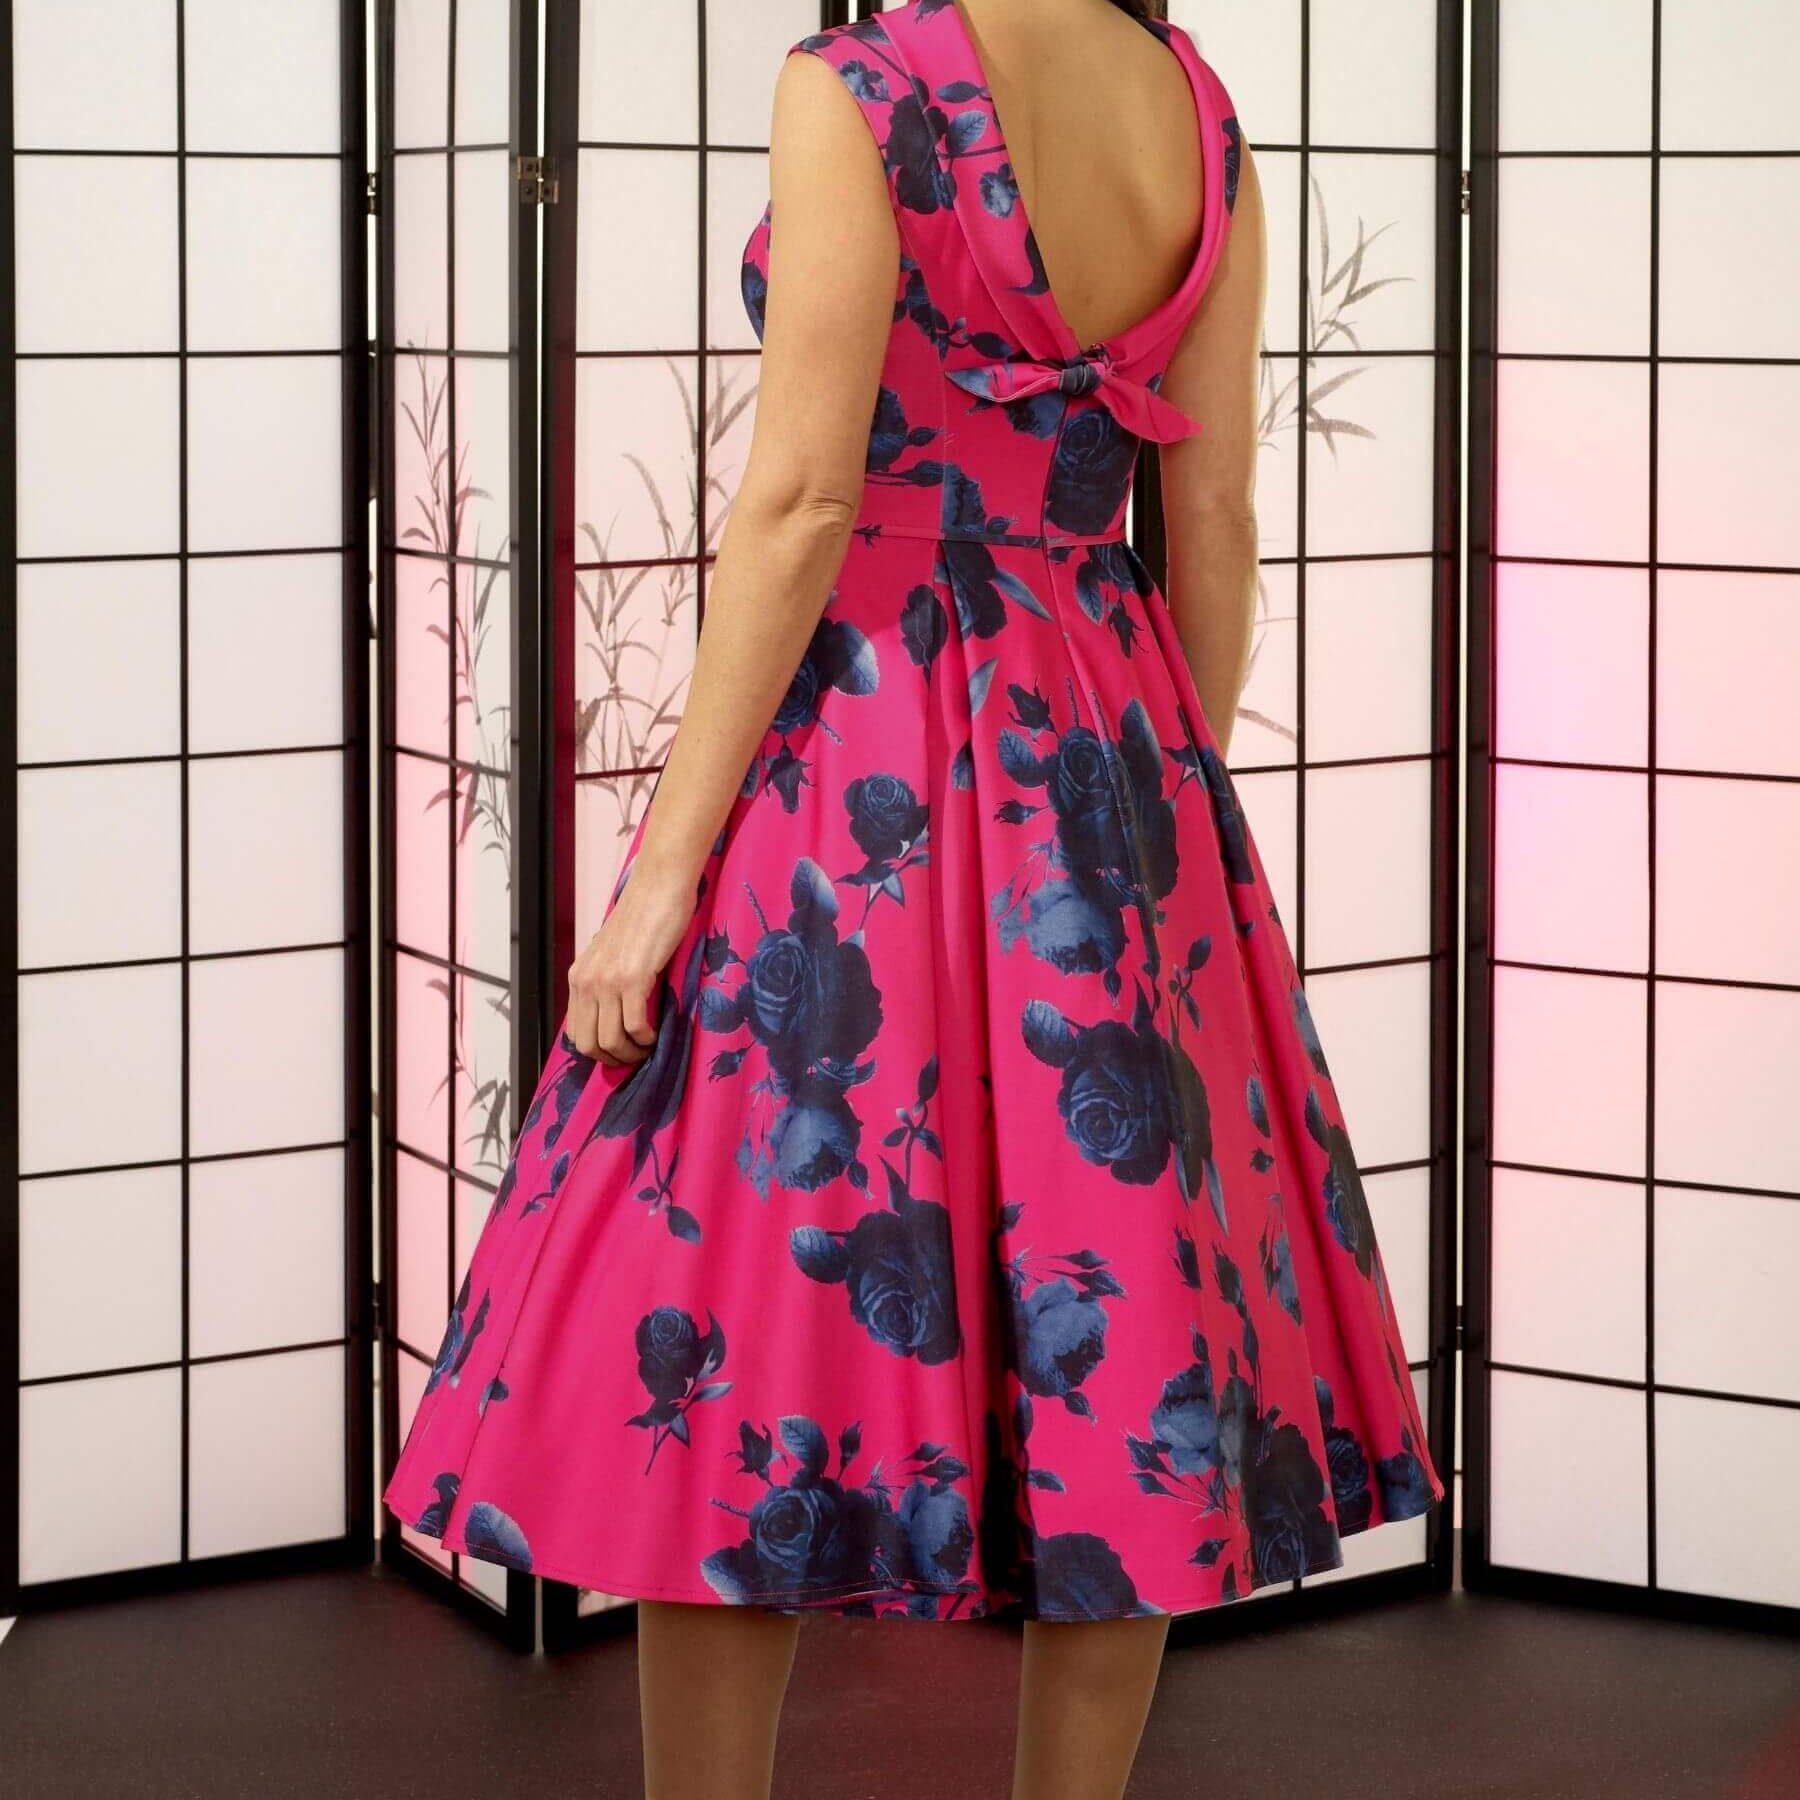 veromia-occasions-vo6419-pink-navy-back_8631b870-b3f9-4e36-b4f8-f12686c5a658